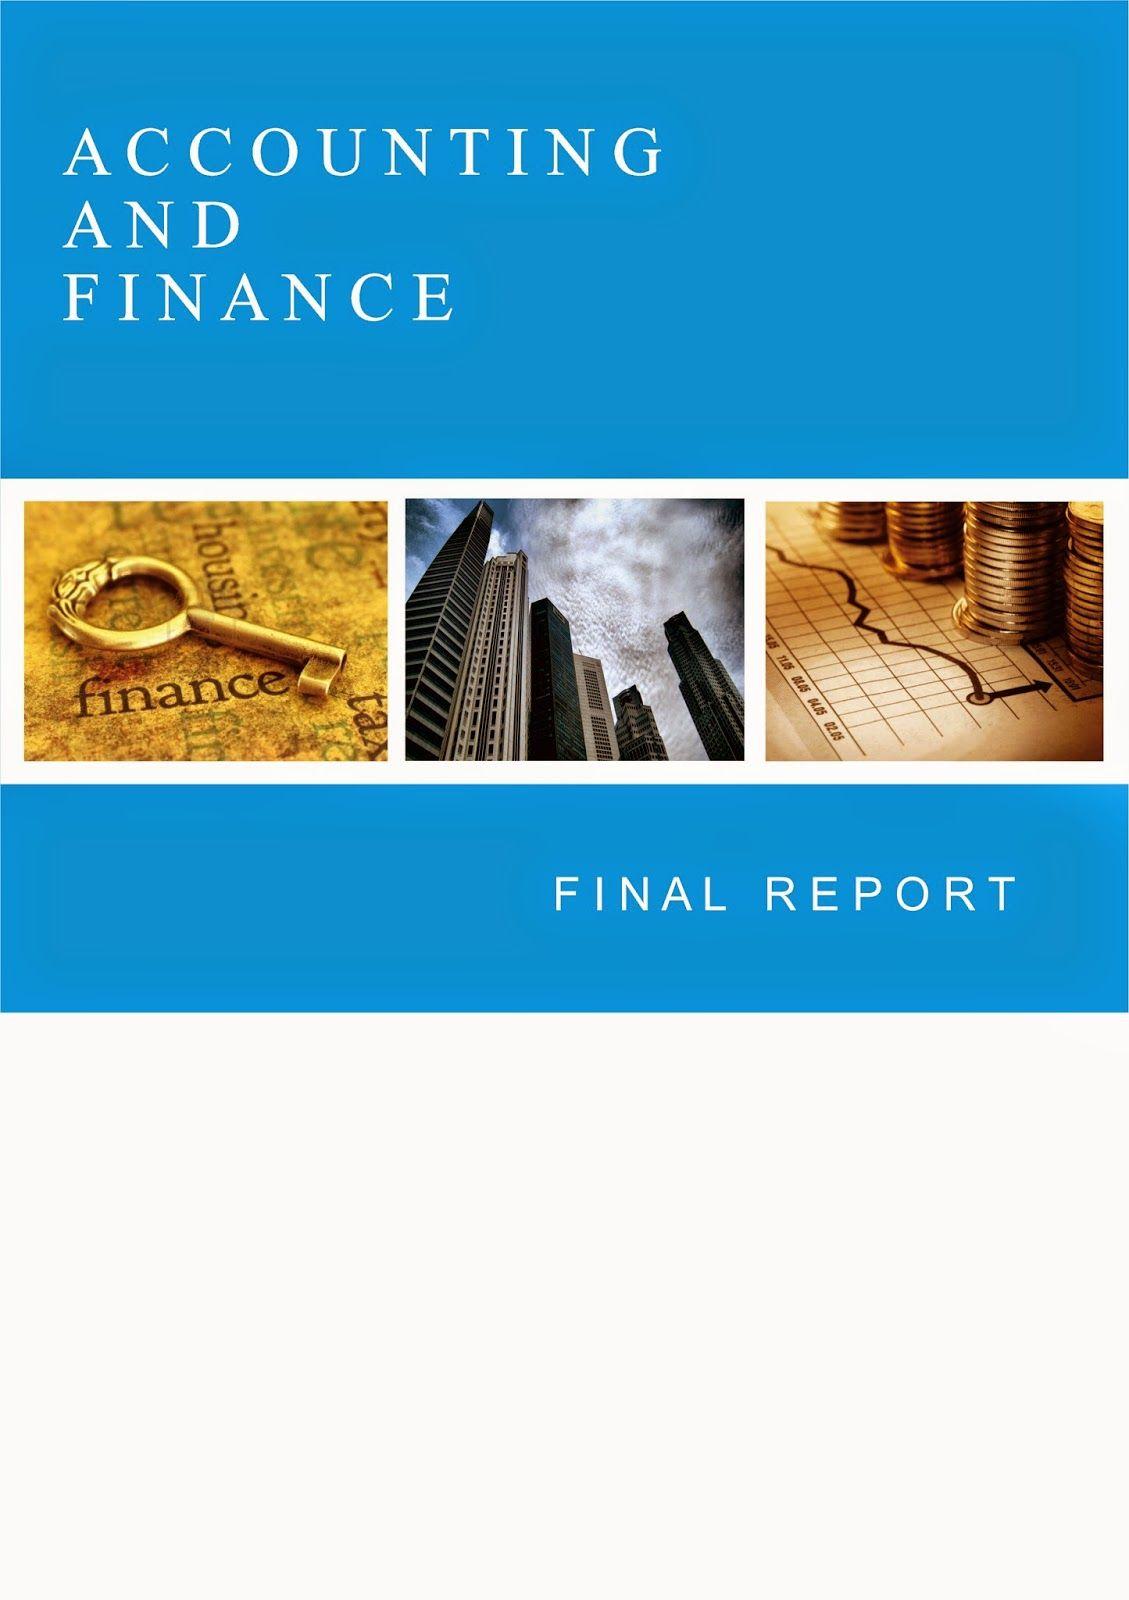 Download Contoh Cover Laporan Keuangan Laporan Keuangan